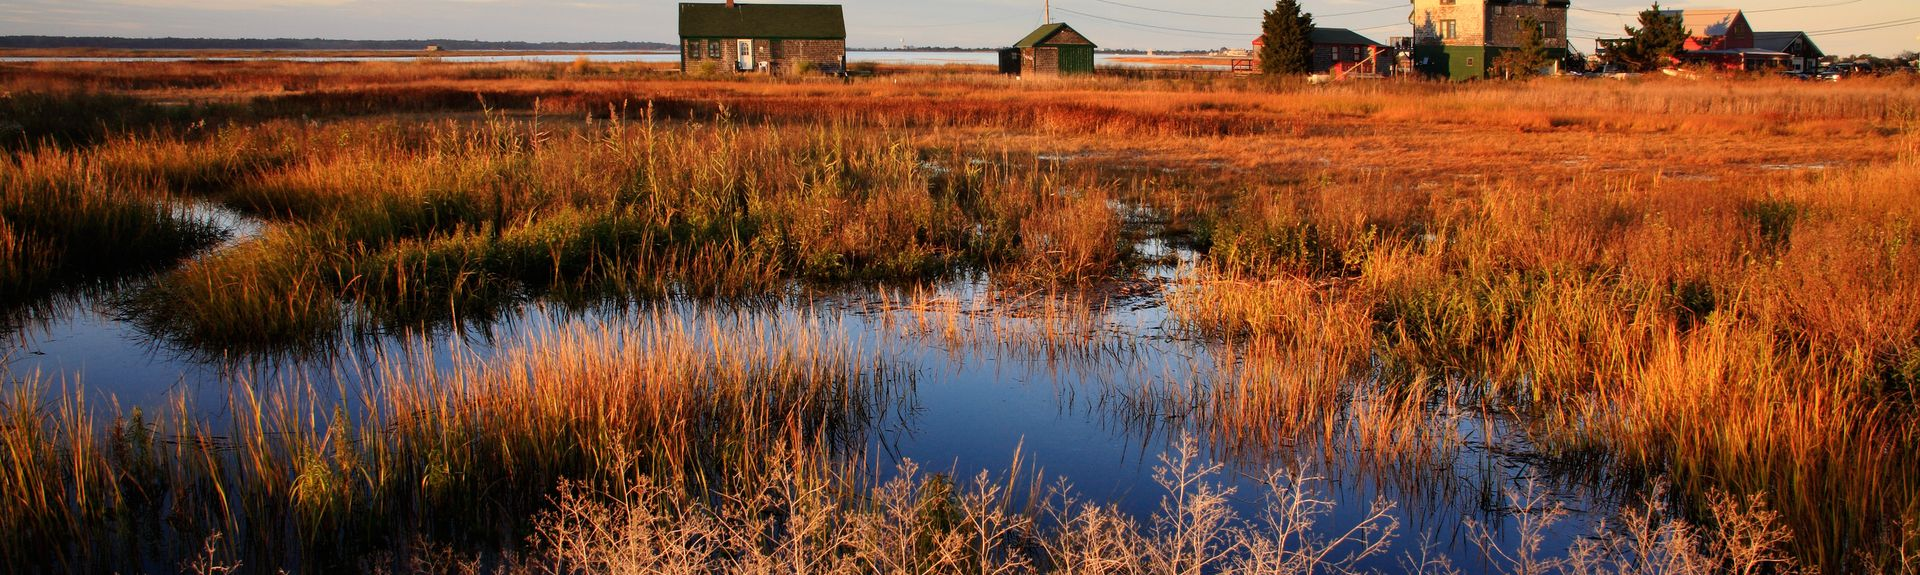 Plum Island, Massachusetts, USA